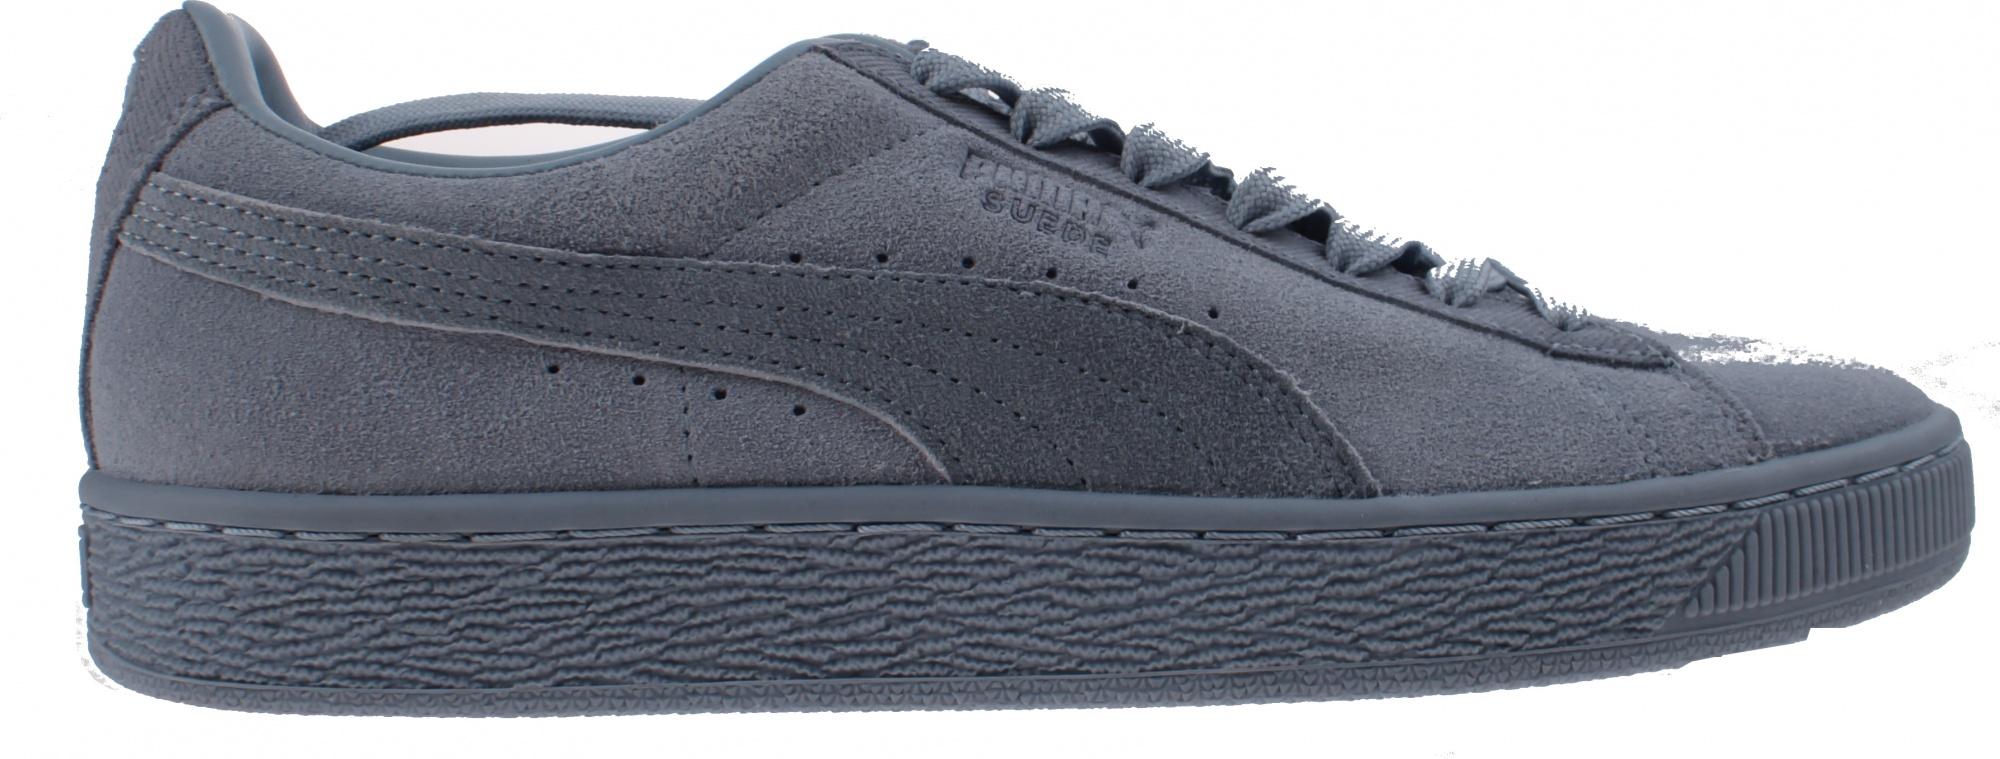 a423f819a03f Puma sneakers Suede Classic Tonal Blue Fog men with 36 - Internet ...